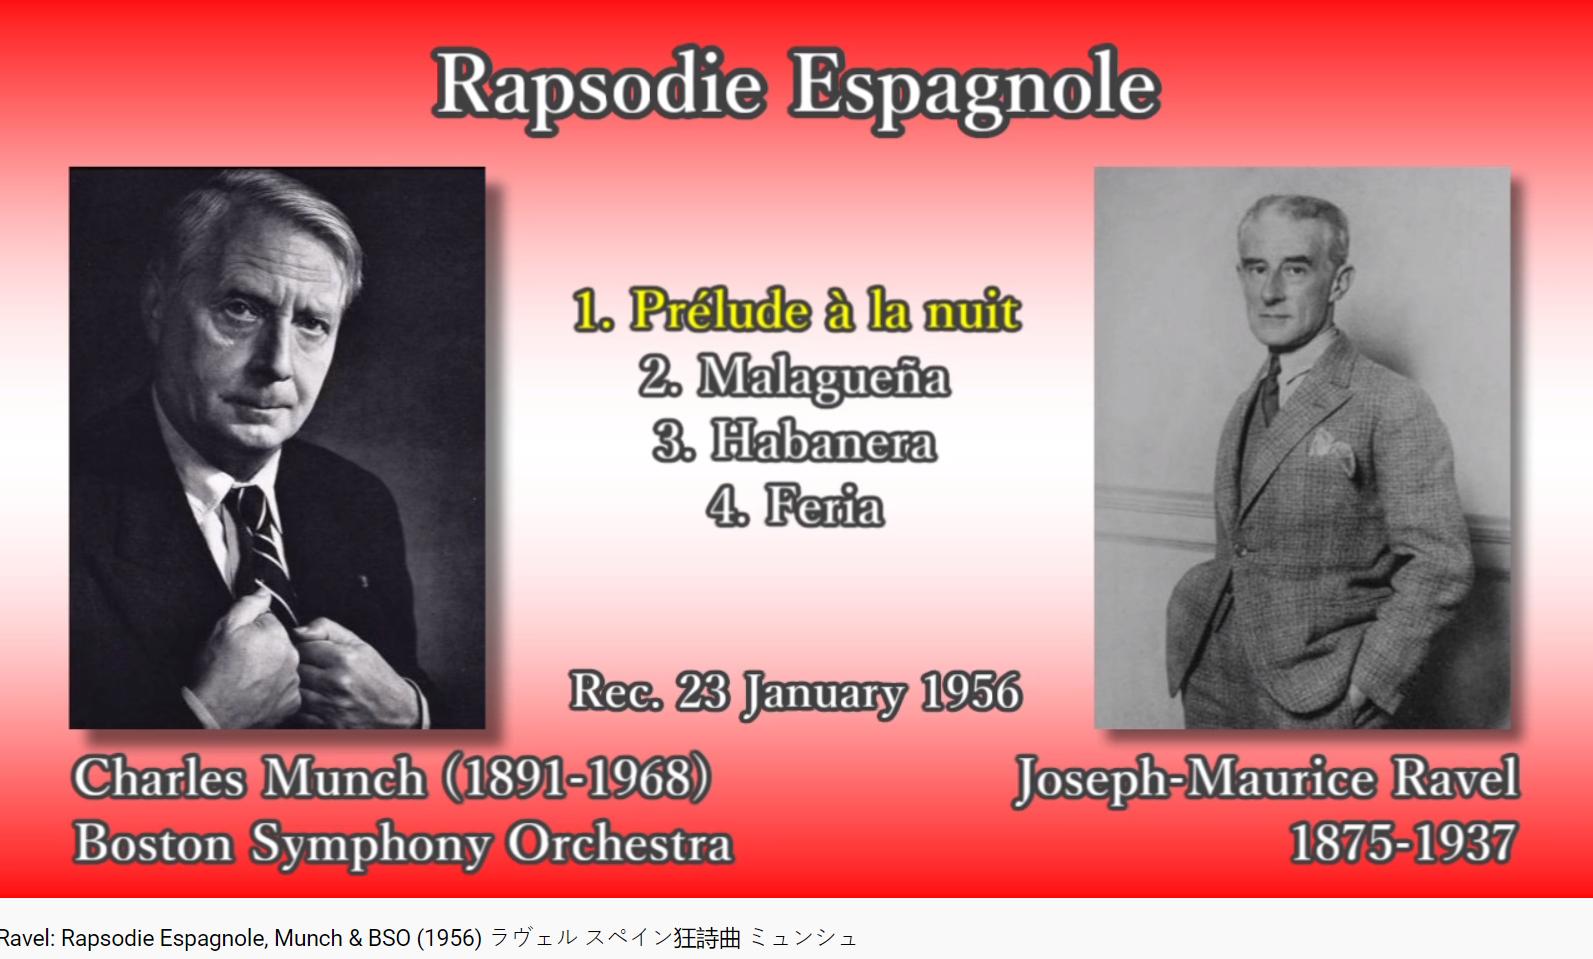 Ravel Rapsodie espagnole (Munch)